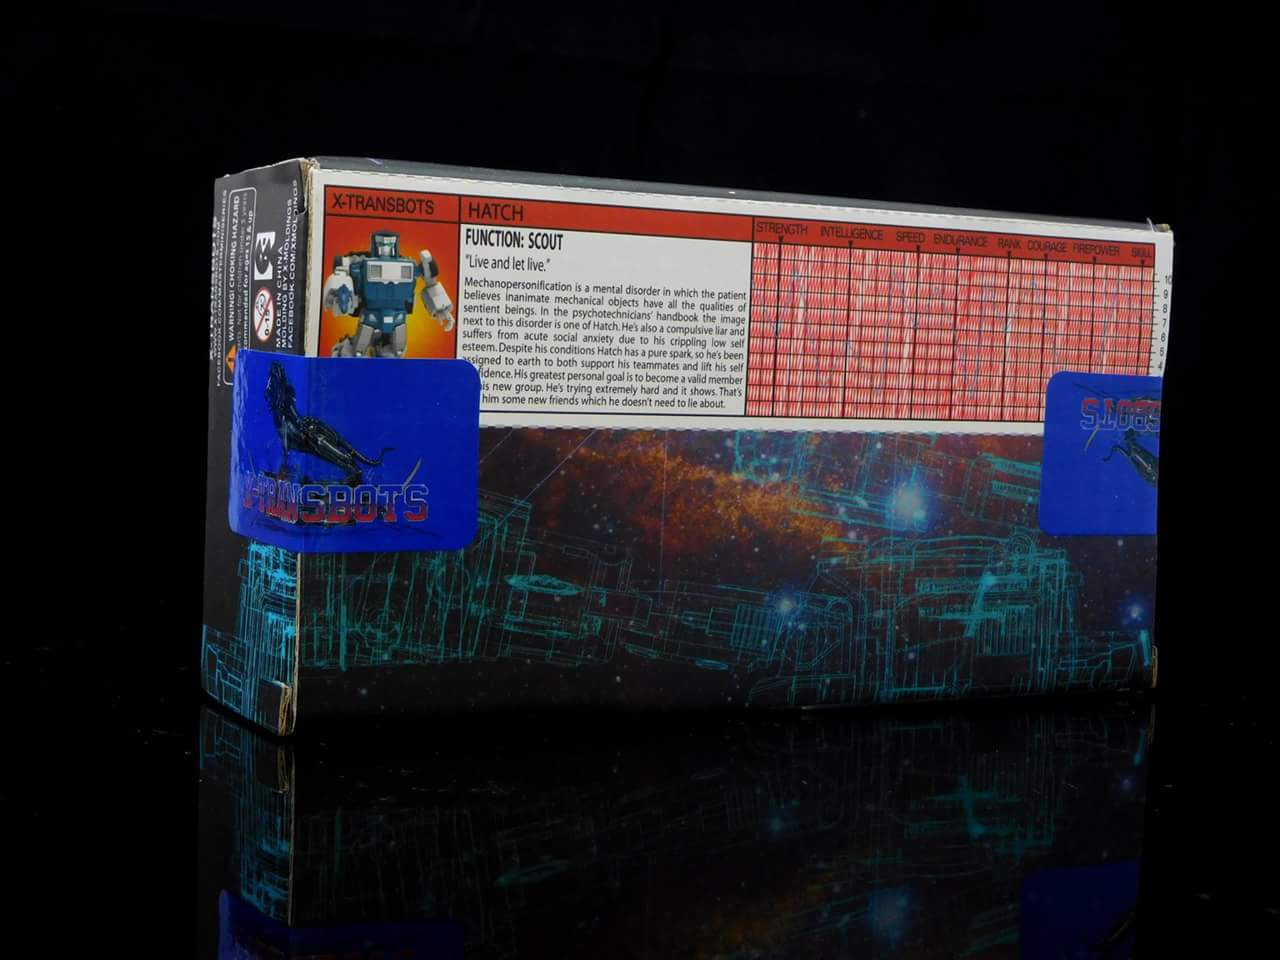 [X-Transbots] Produit Tiers - Minibots MP - Gamme MM - Page 6 WLEhhSYE